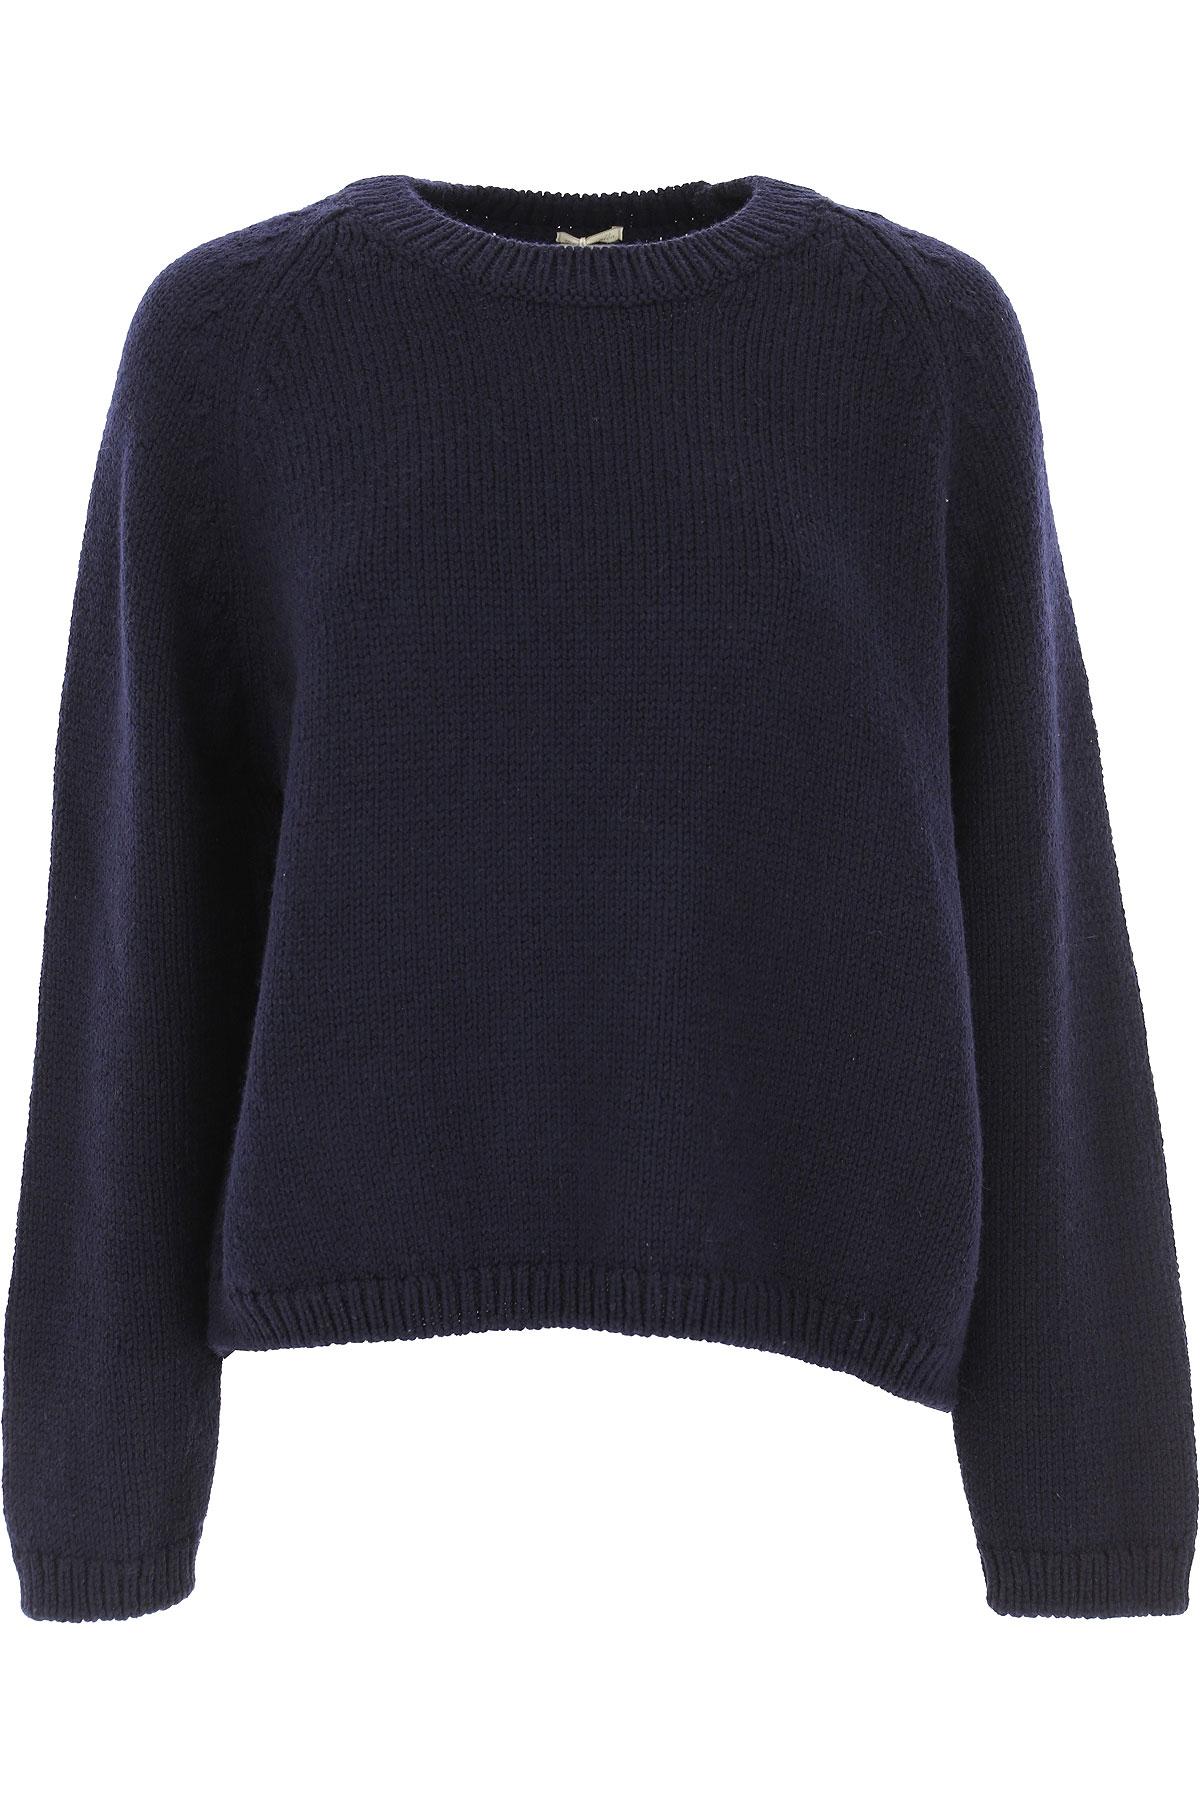 Massimo Alba Sweater for Women Jumper On Sale, Navy Blue, Wool, 2019, 6 8